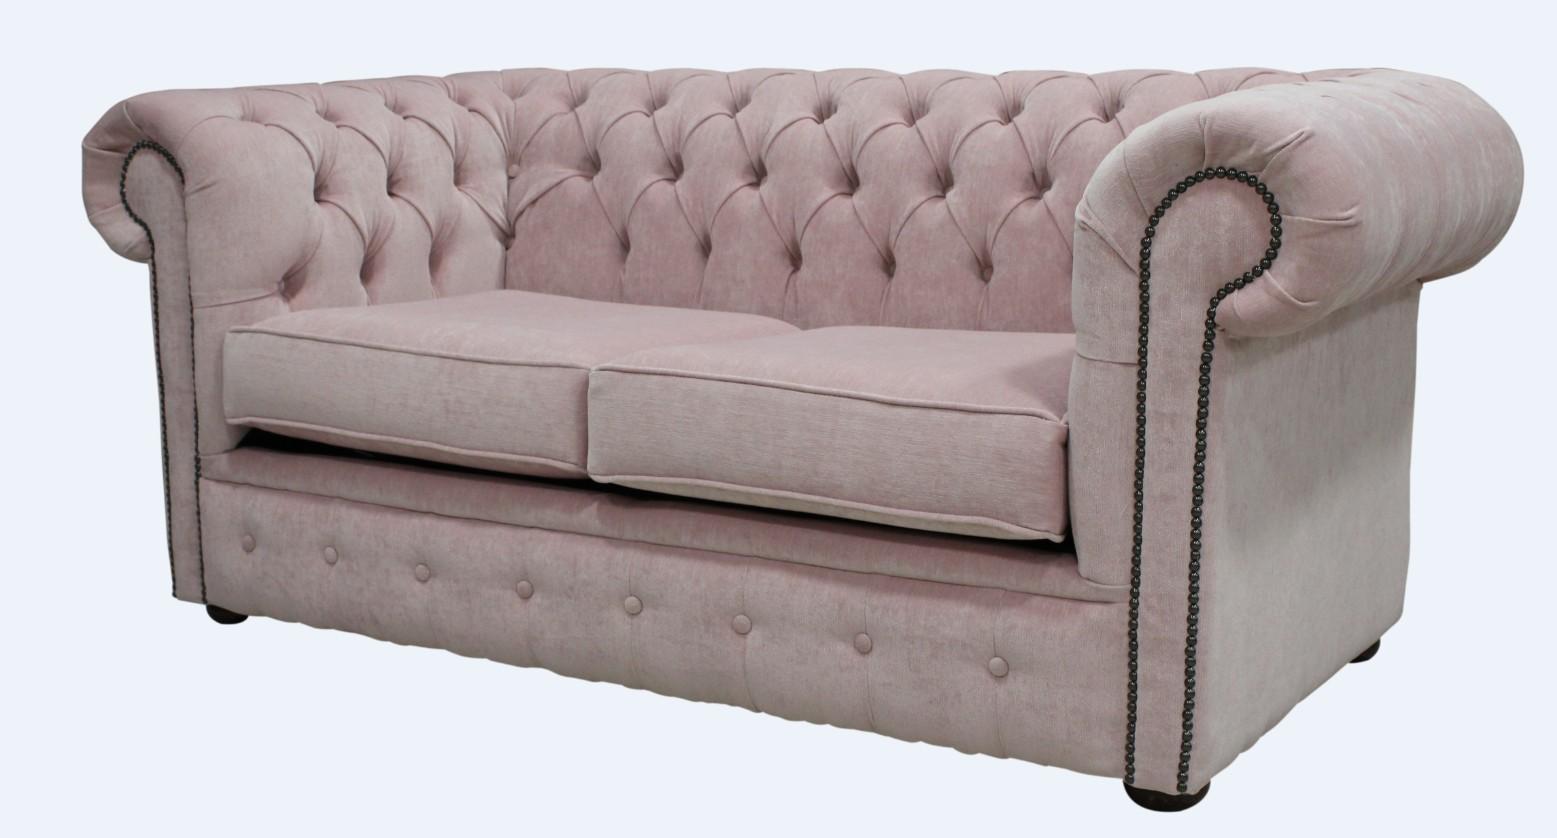 Buy Blush Pink Fabric Chesterfield Sofa Designersofas4u